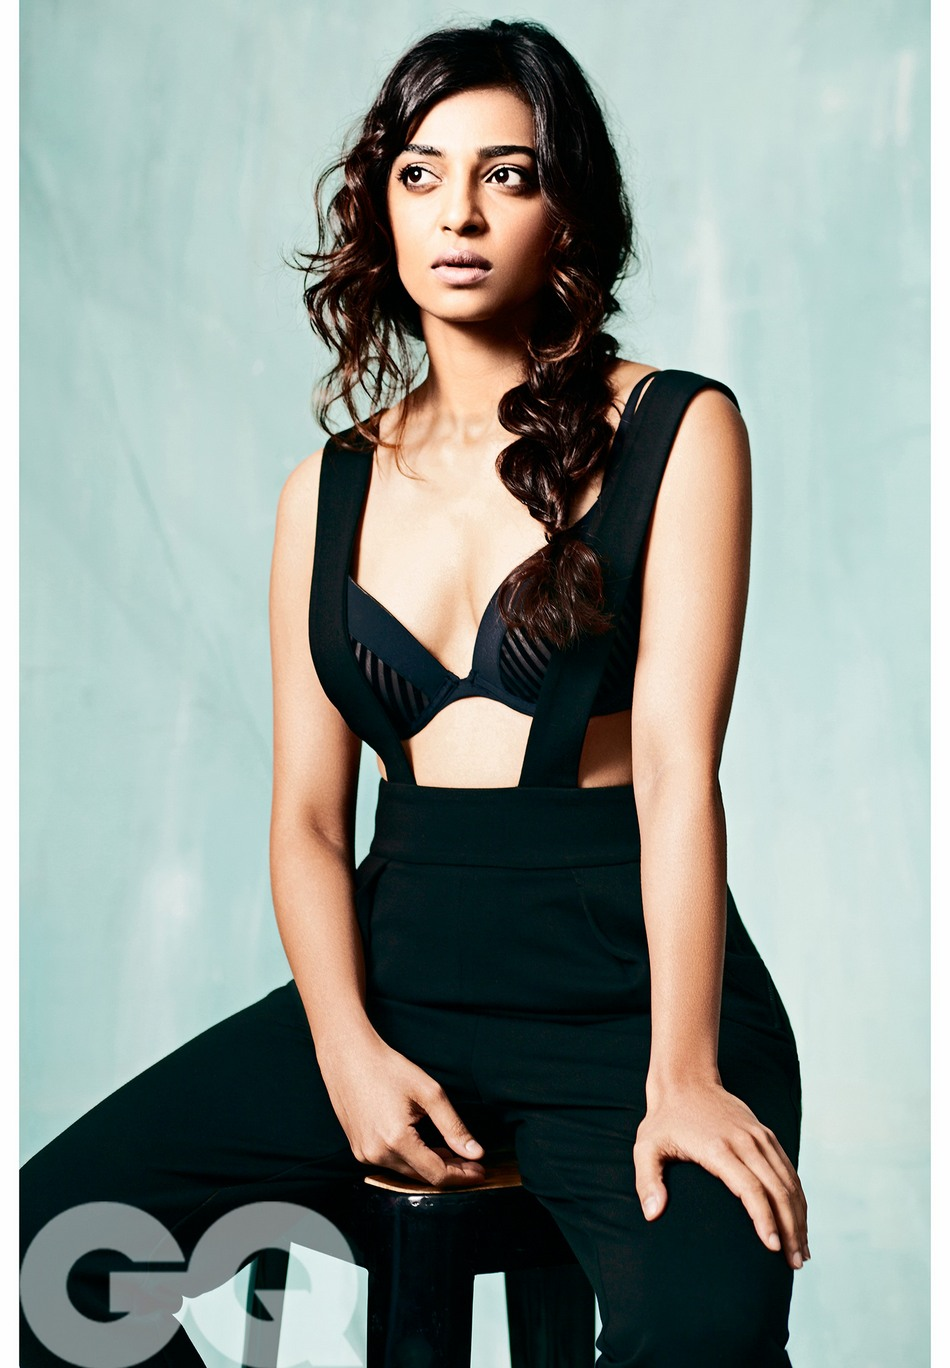 radhika-apte-sexy-hot-photoshoot-gq-magazine-marathi-2016 (6)